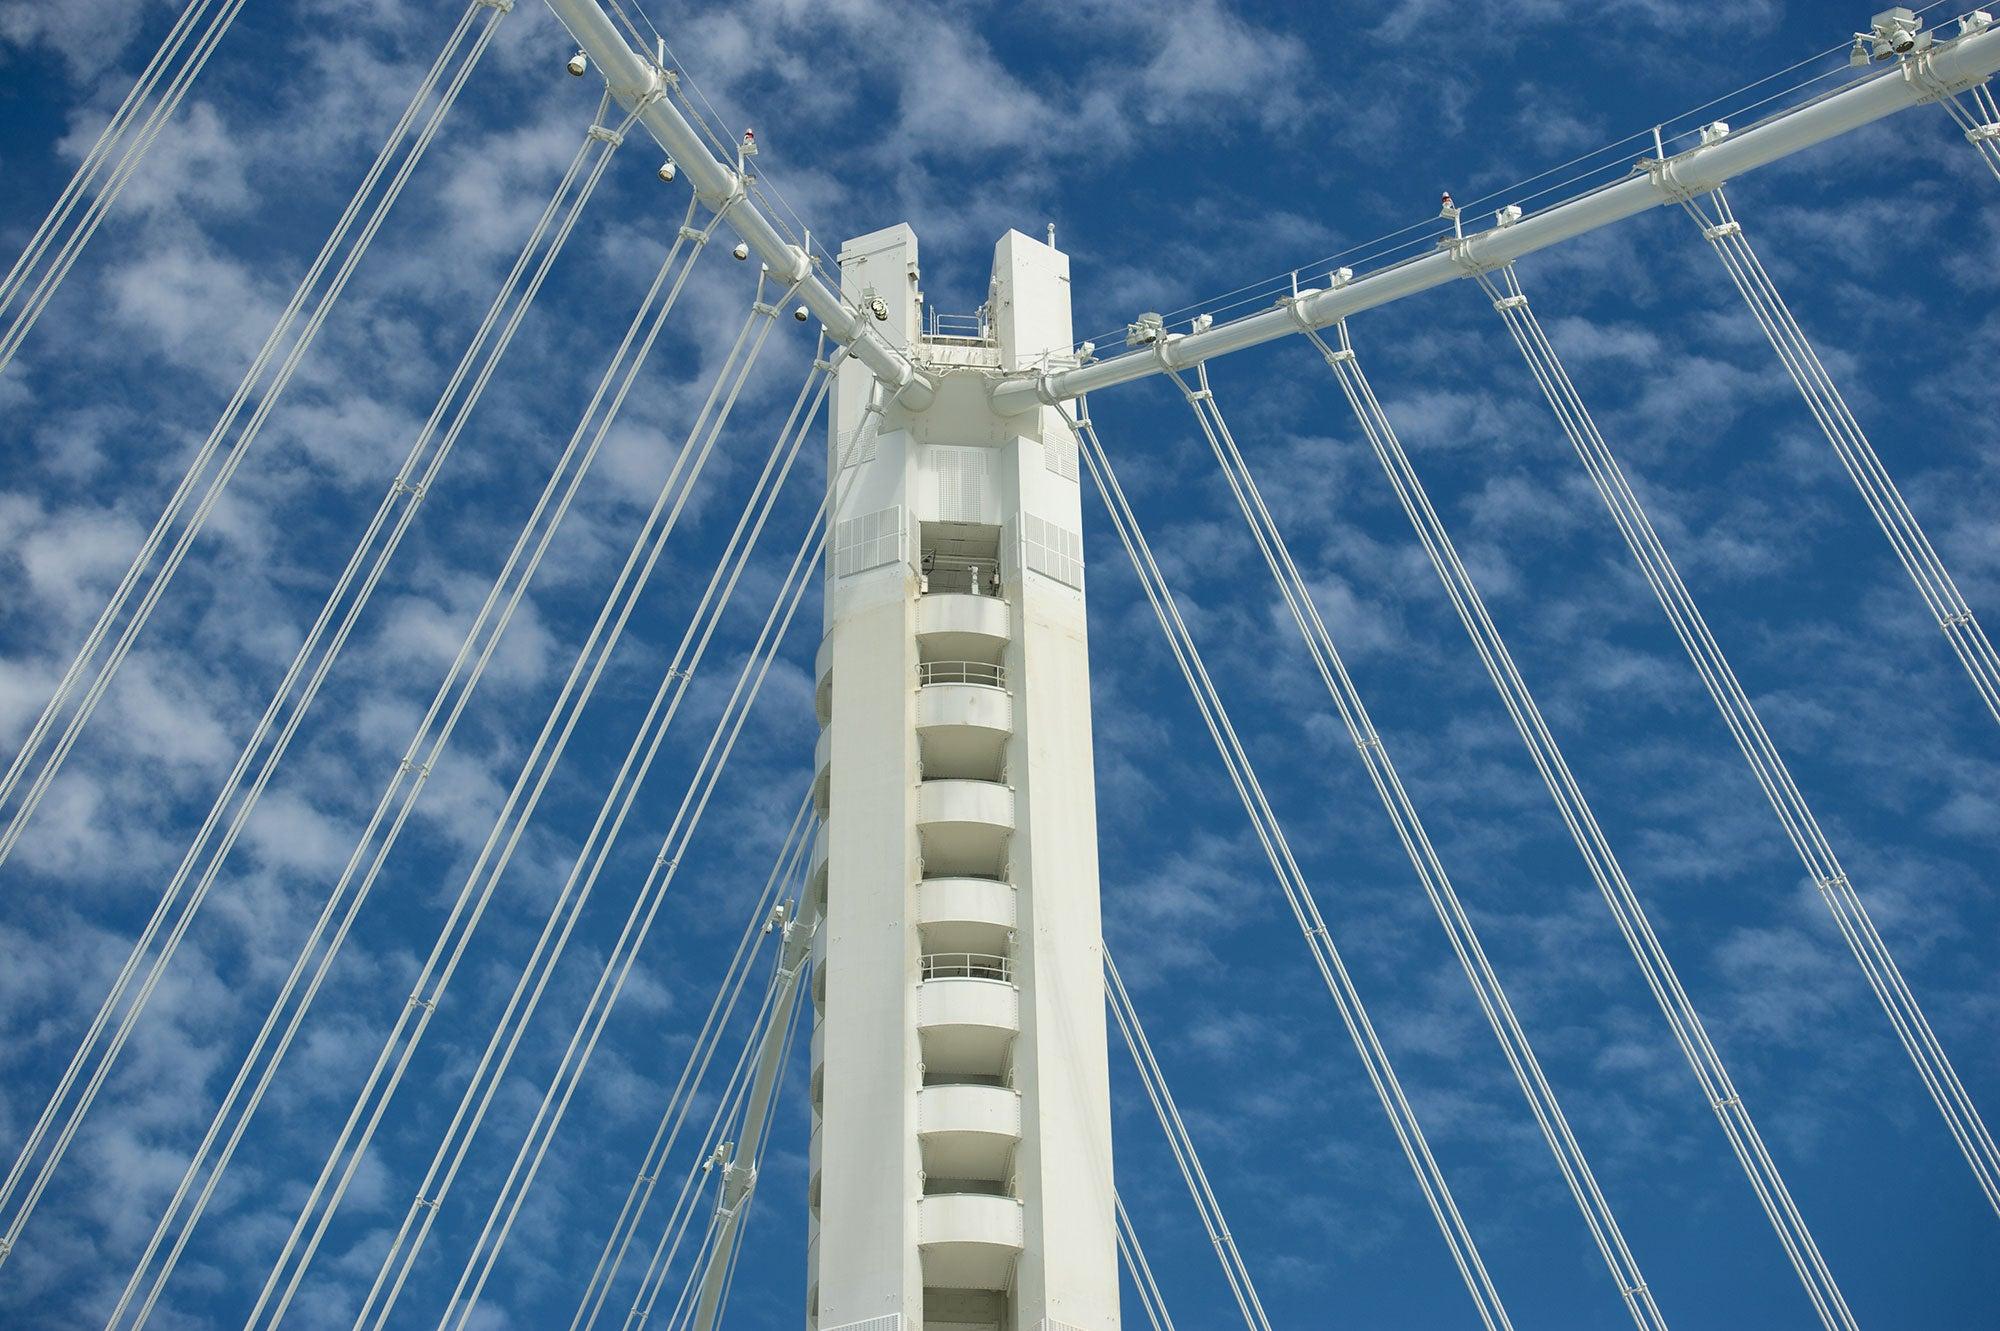 New East Span of the San Francisco-Oakland Bay Bridge